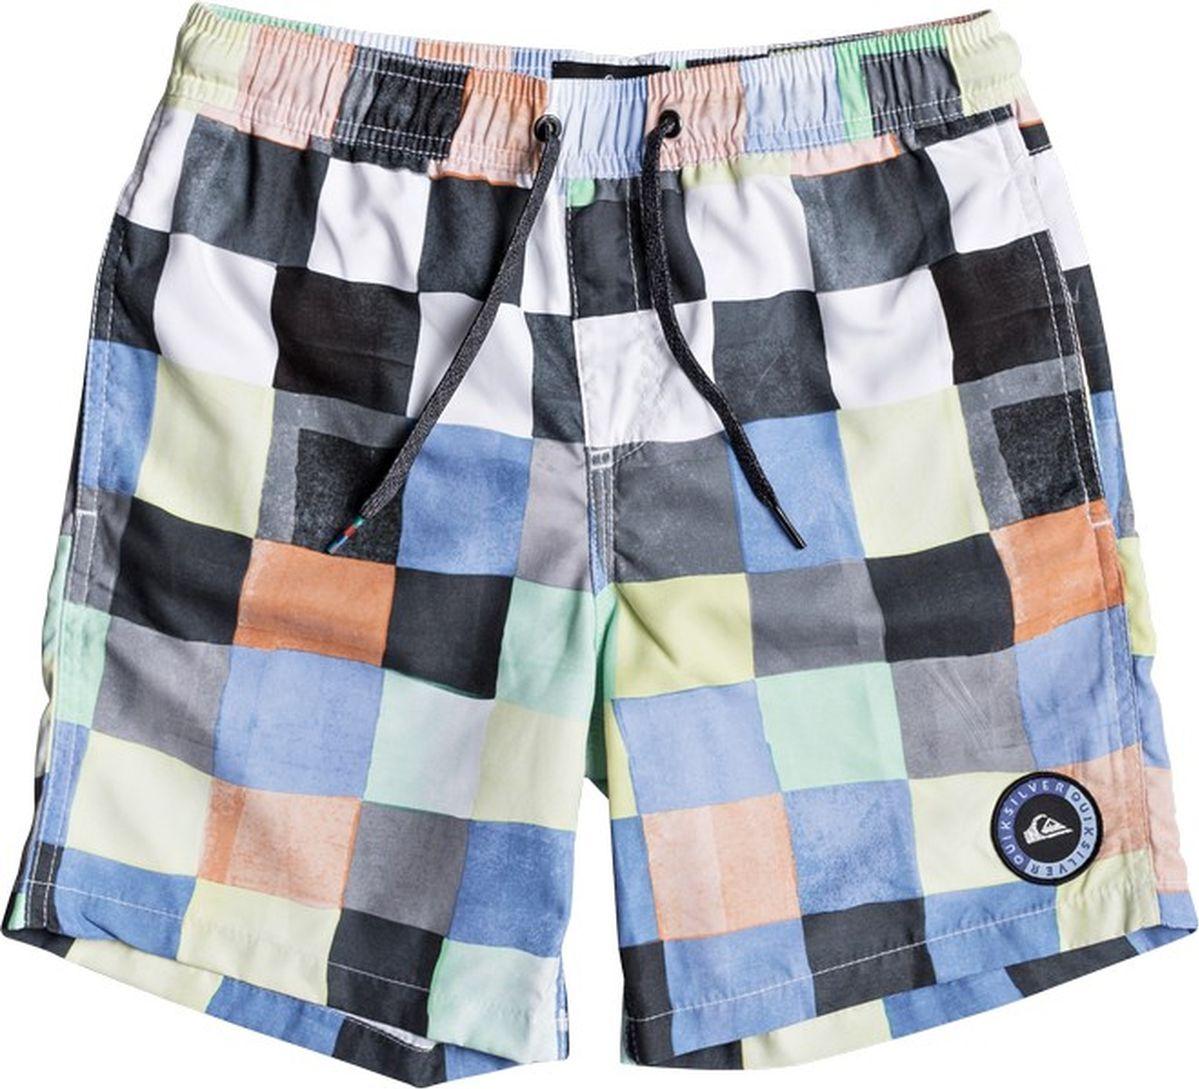 Шорты для мальчика Quiksilver, цвет: мультиколор. EQBJV03139-WBB6. Размер 134/140